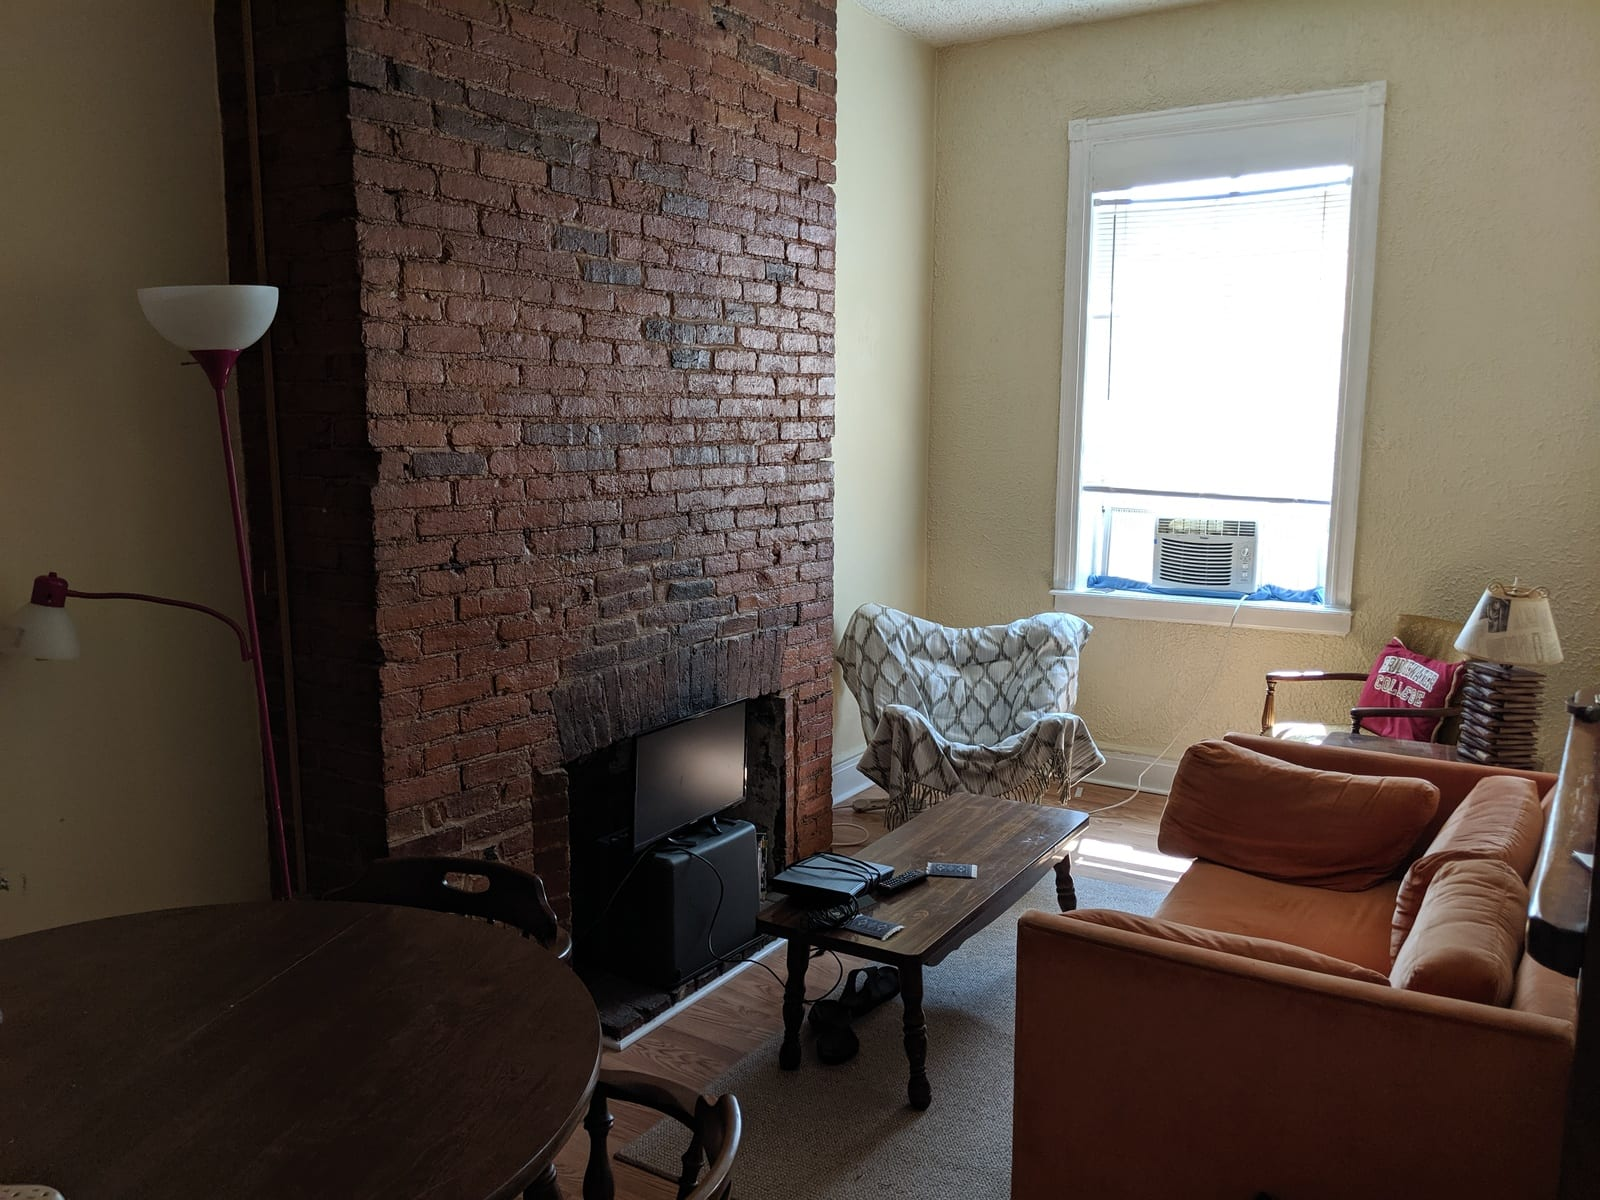 61 617 Paca 3 Living room